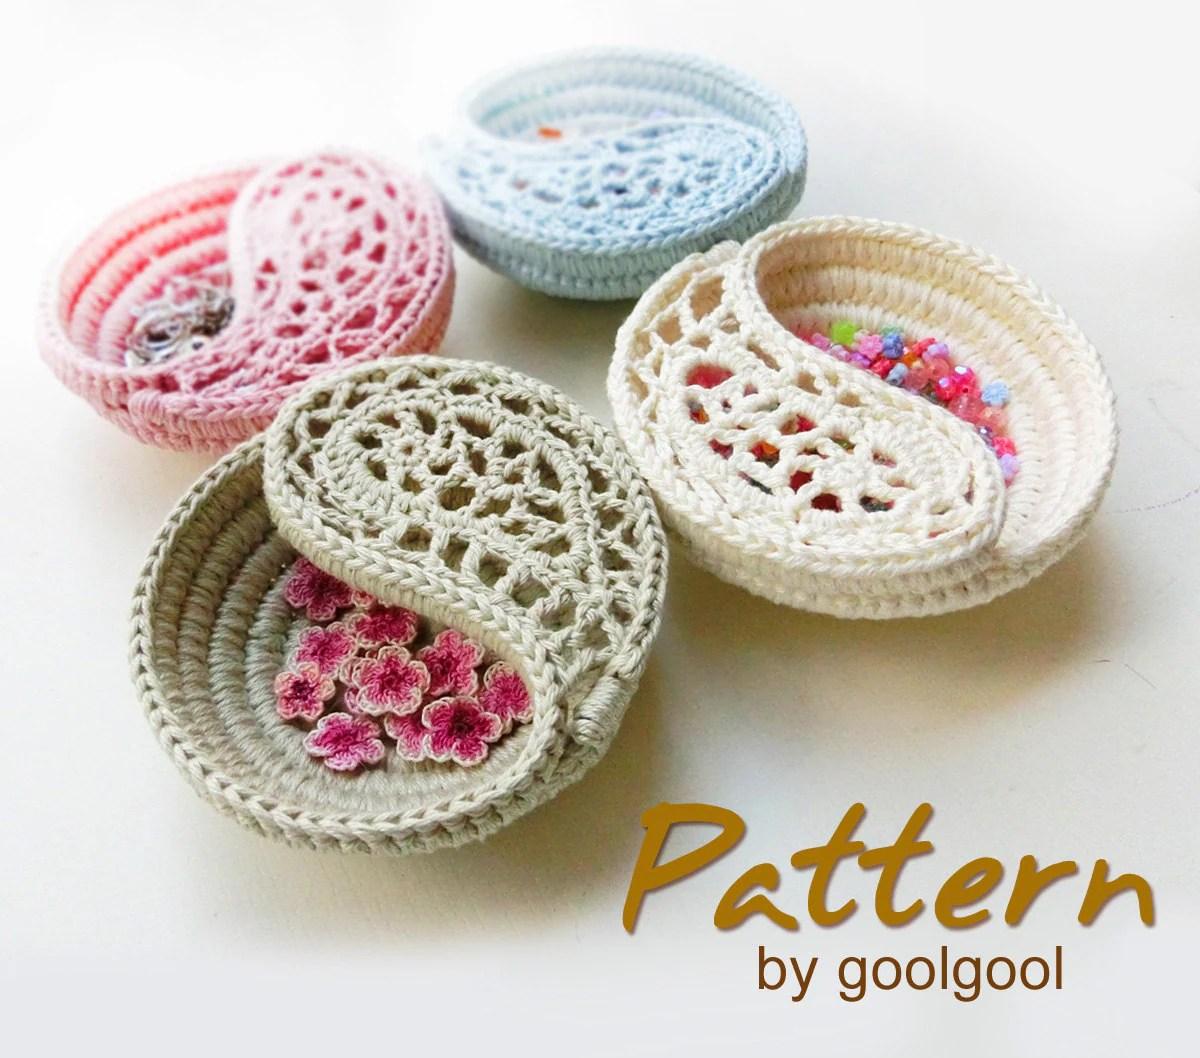 CROCHET PATTERN 4 Yin Yang Dish Freeform Crochet By Goolgool